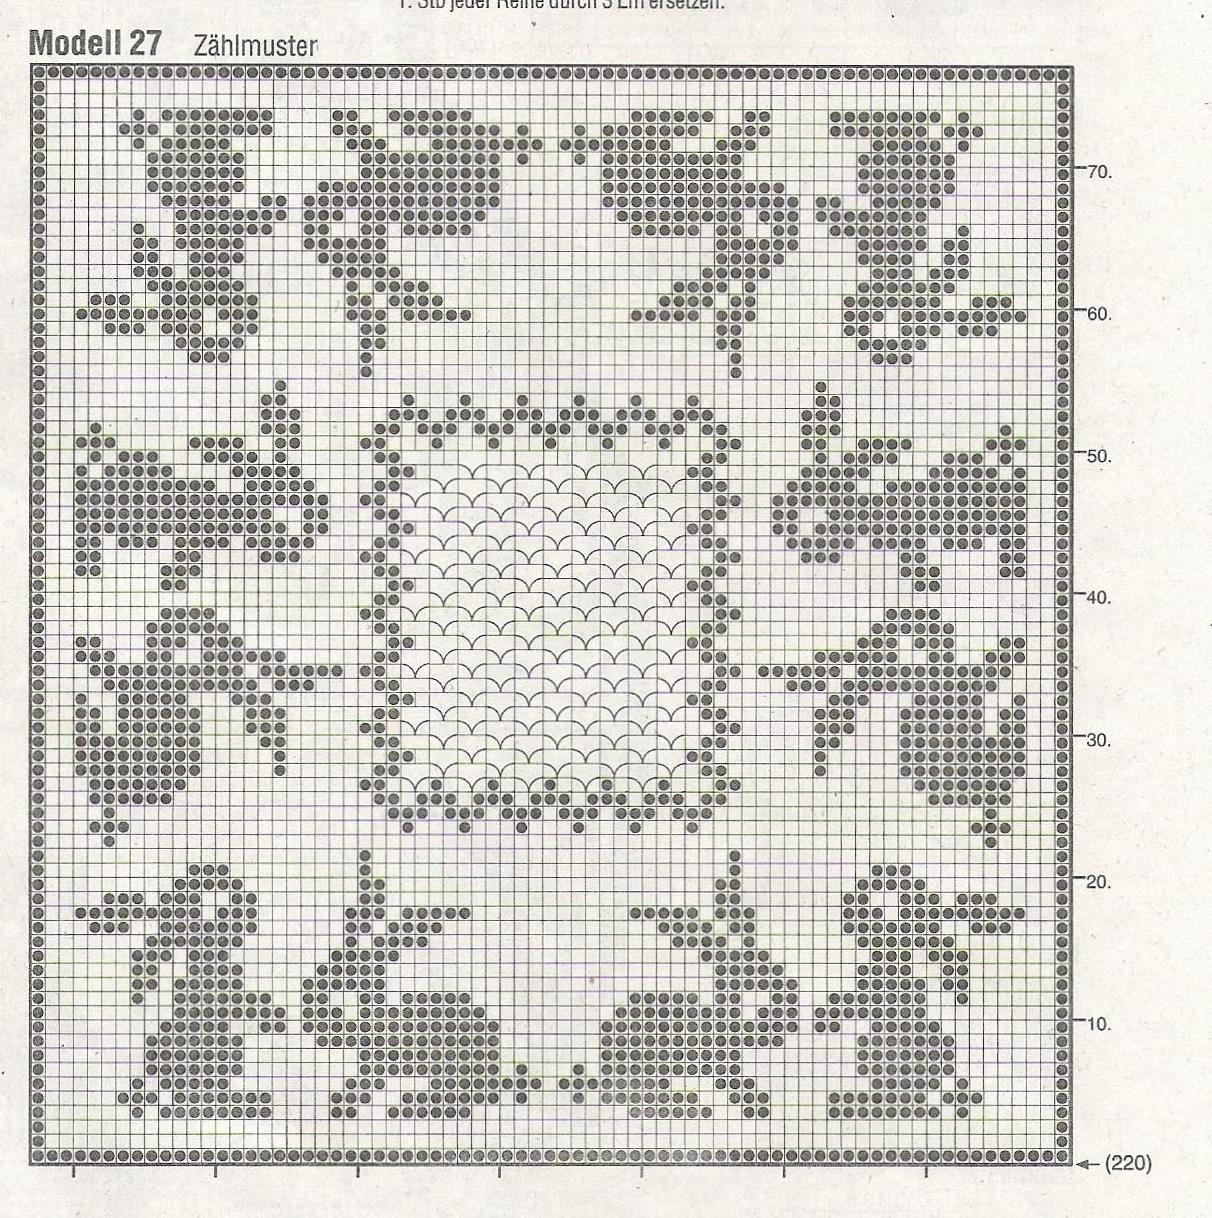 fileth keln gardinen vorlagen ile ilgili g rsel sonucu battaniye pinterest filet crochet. Black Bedroom Furniture Sets. Home Design Ideas